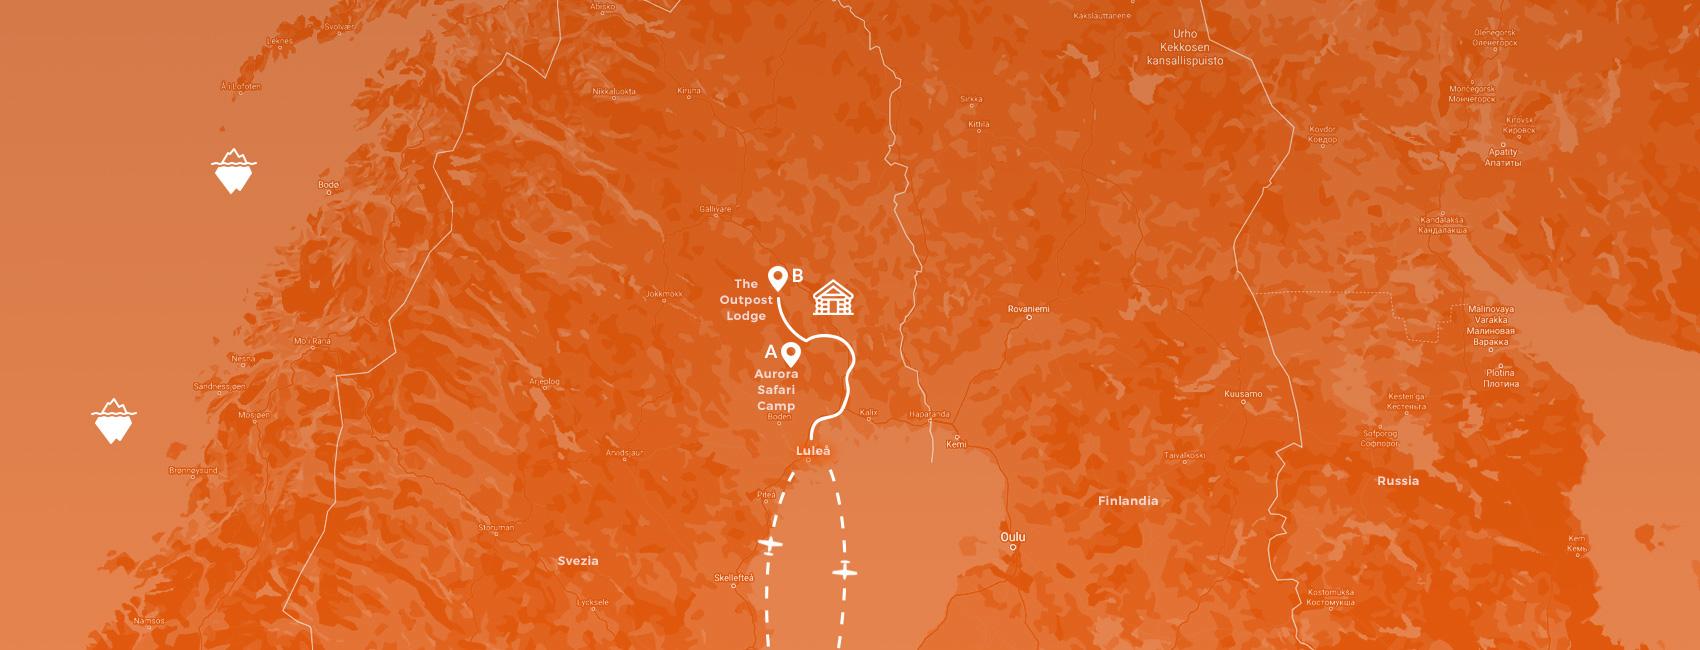 maps svezia - vero safari artico